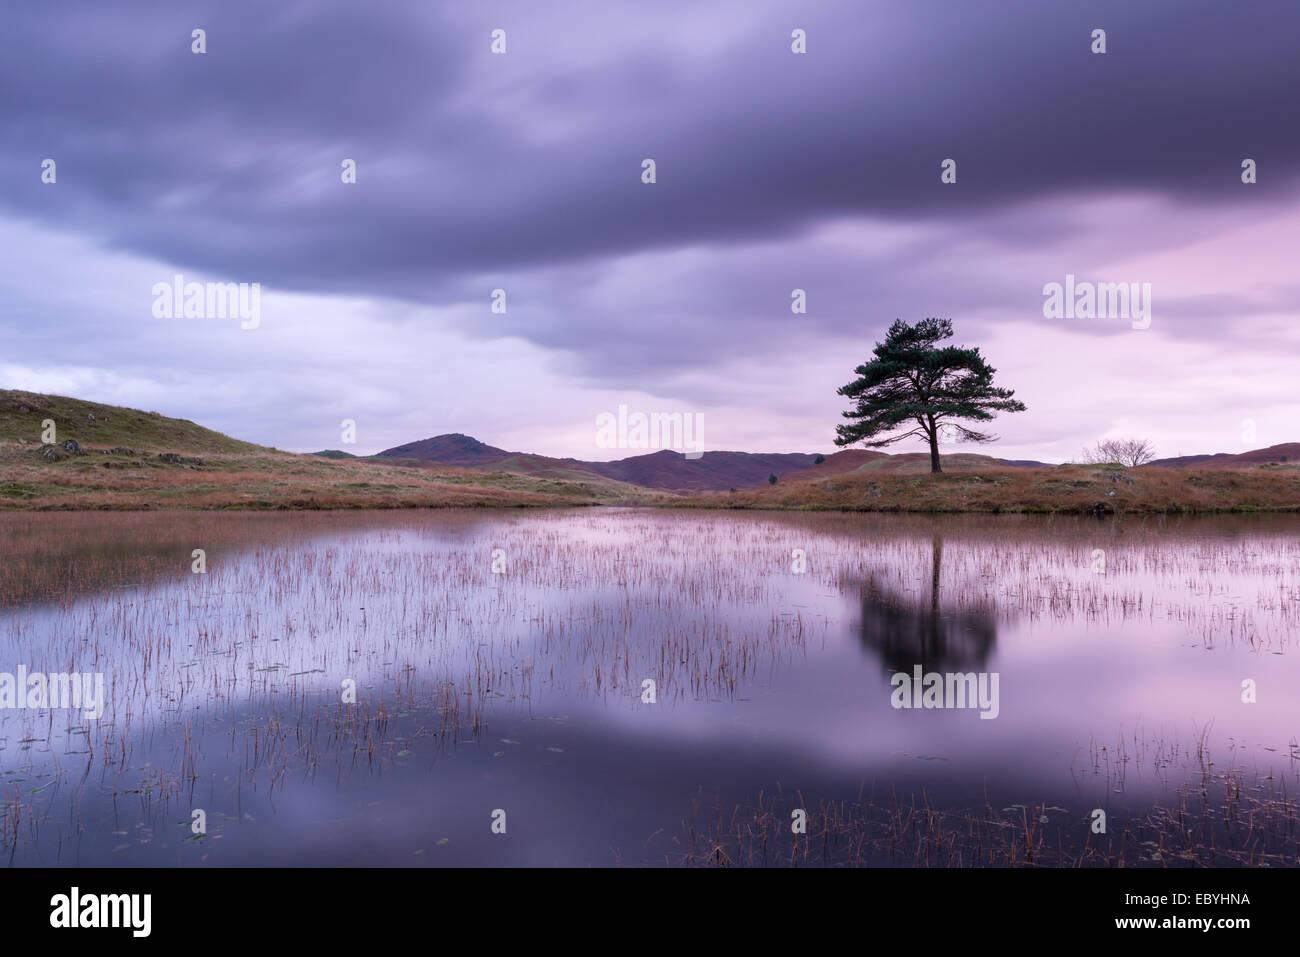 Kelly Hall Tarn bei Dämmerung, Lake District, Cumbria, England. Herbst (November) 2014. Stockbild